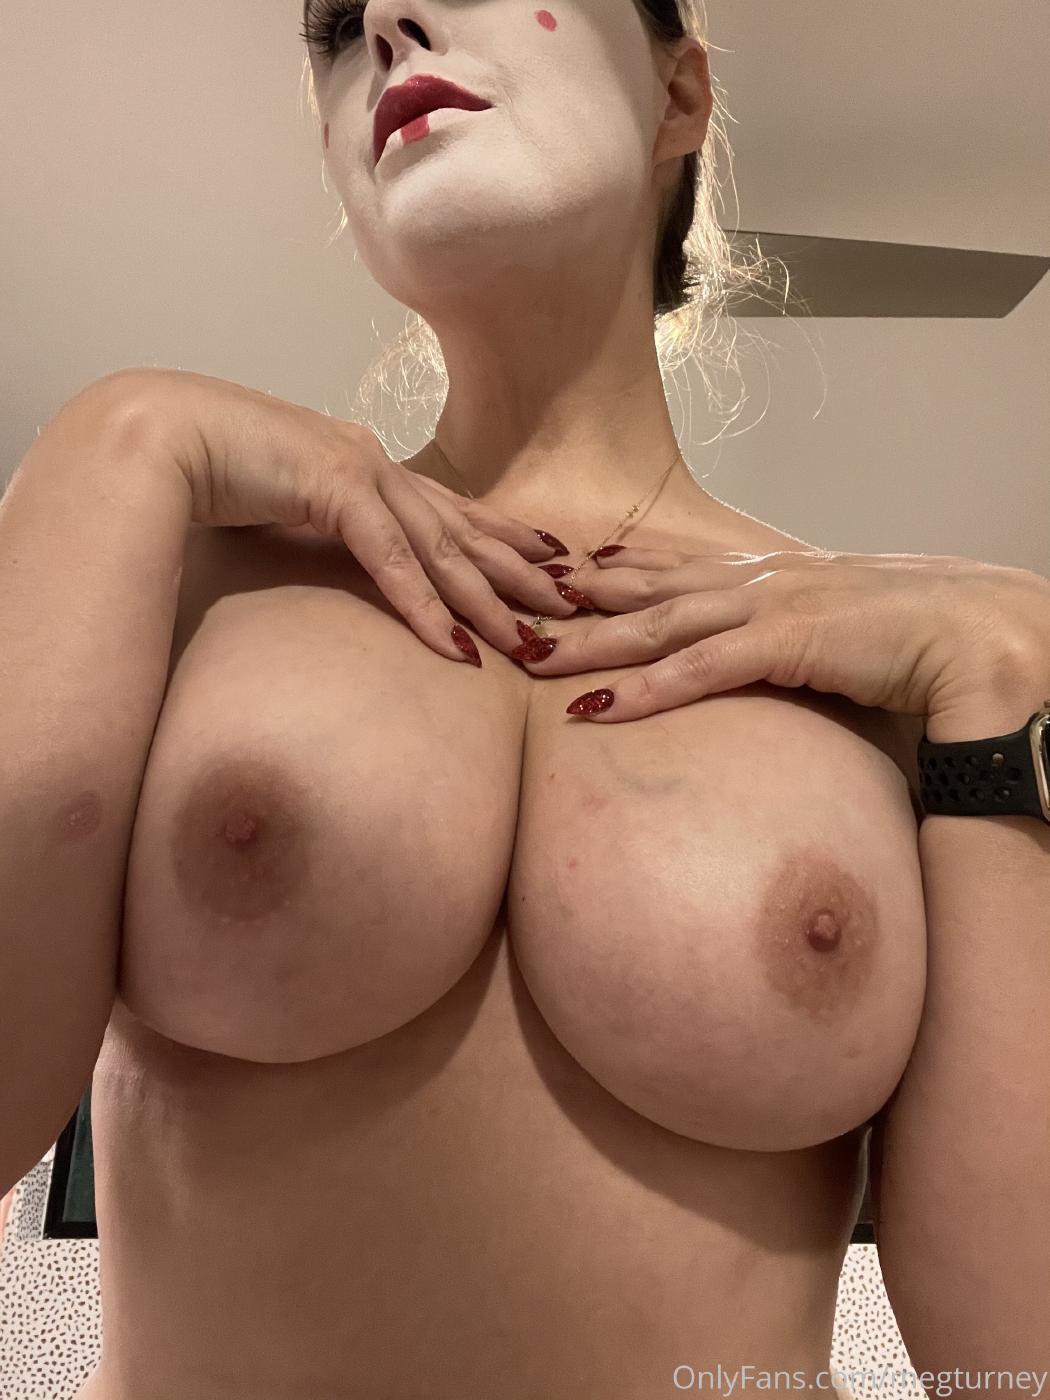 Meg Turney Topless Candids Onlyfans Set Leaked 0005